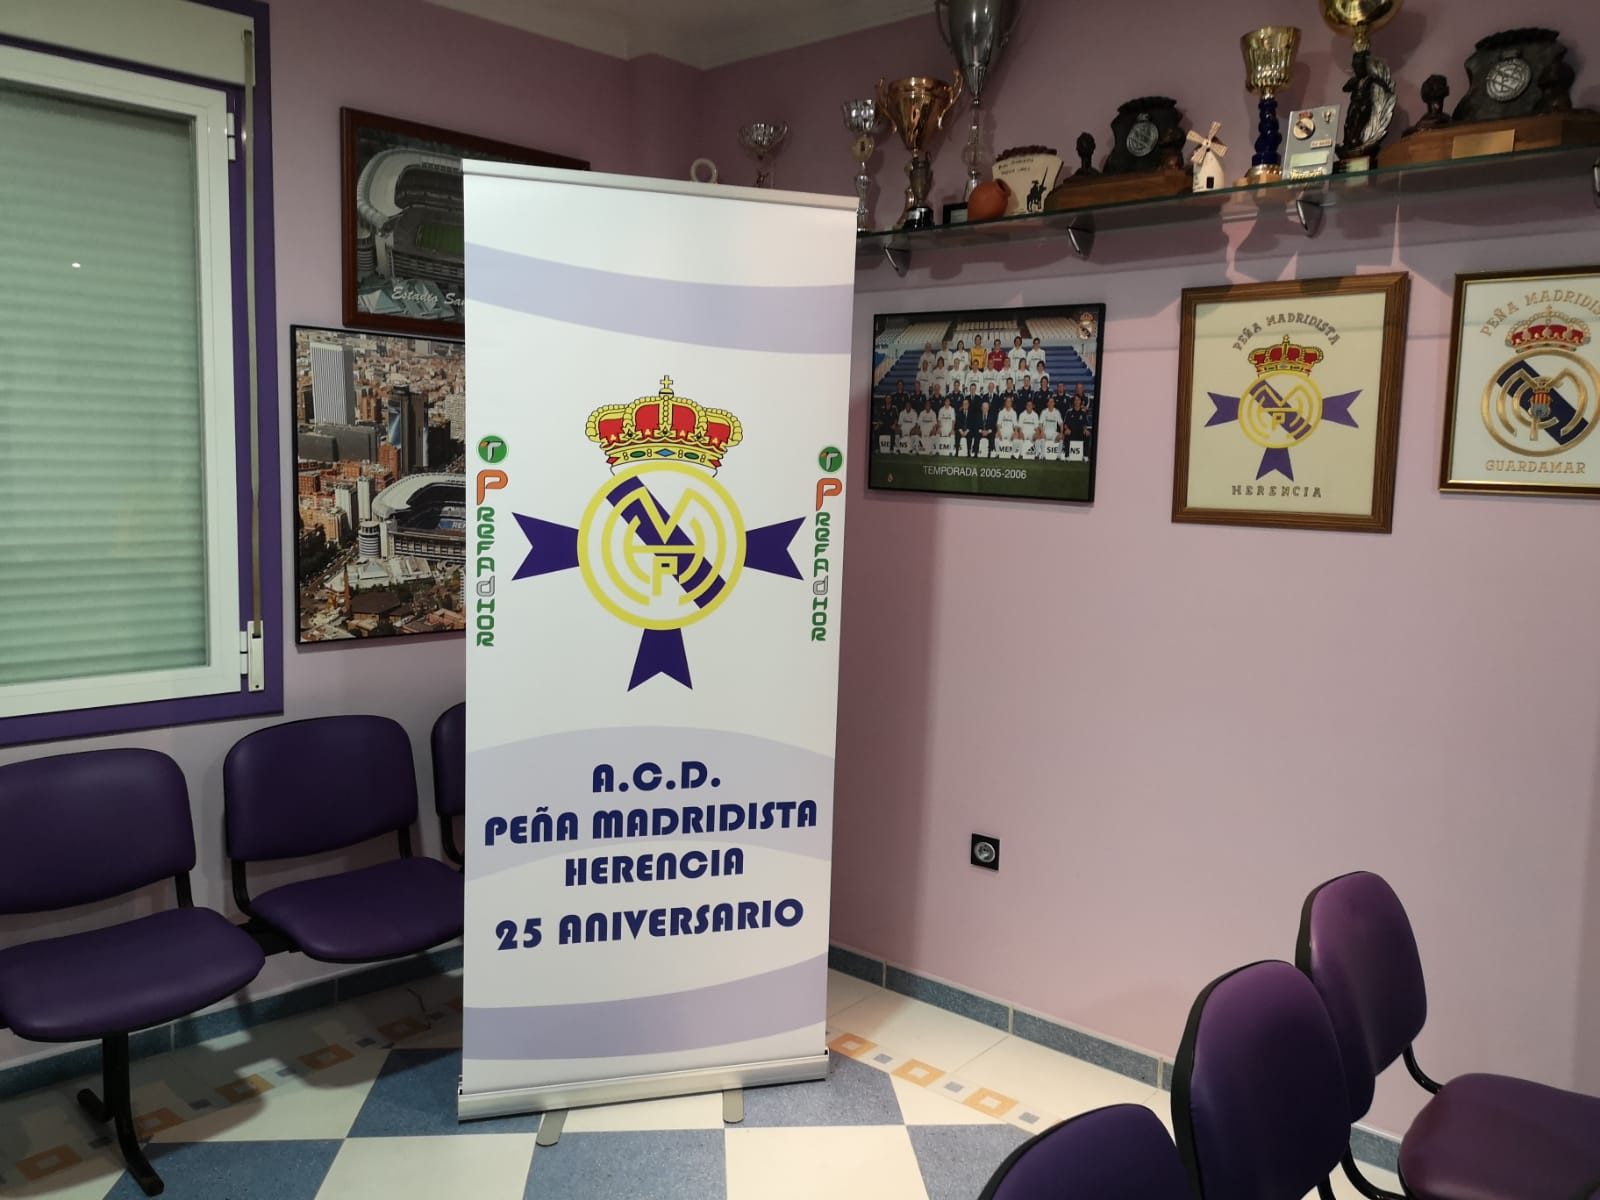 25 aniversario pe%C3%B1a madridista Herencia - Torneo de Minigolf 25 aniversario de la Peña Madridista de Herencia